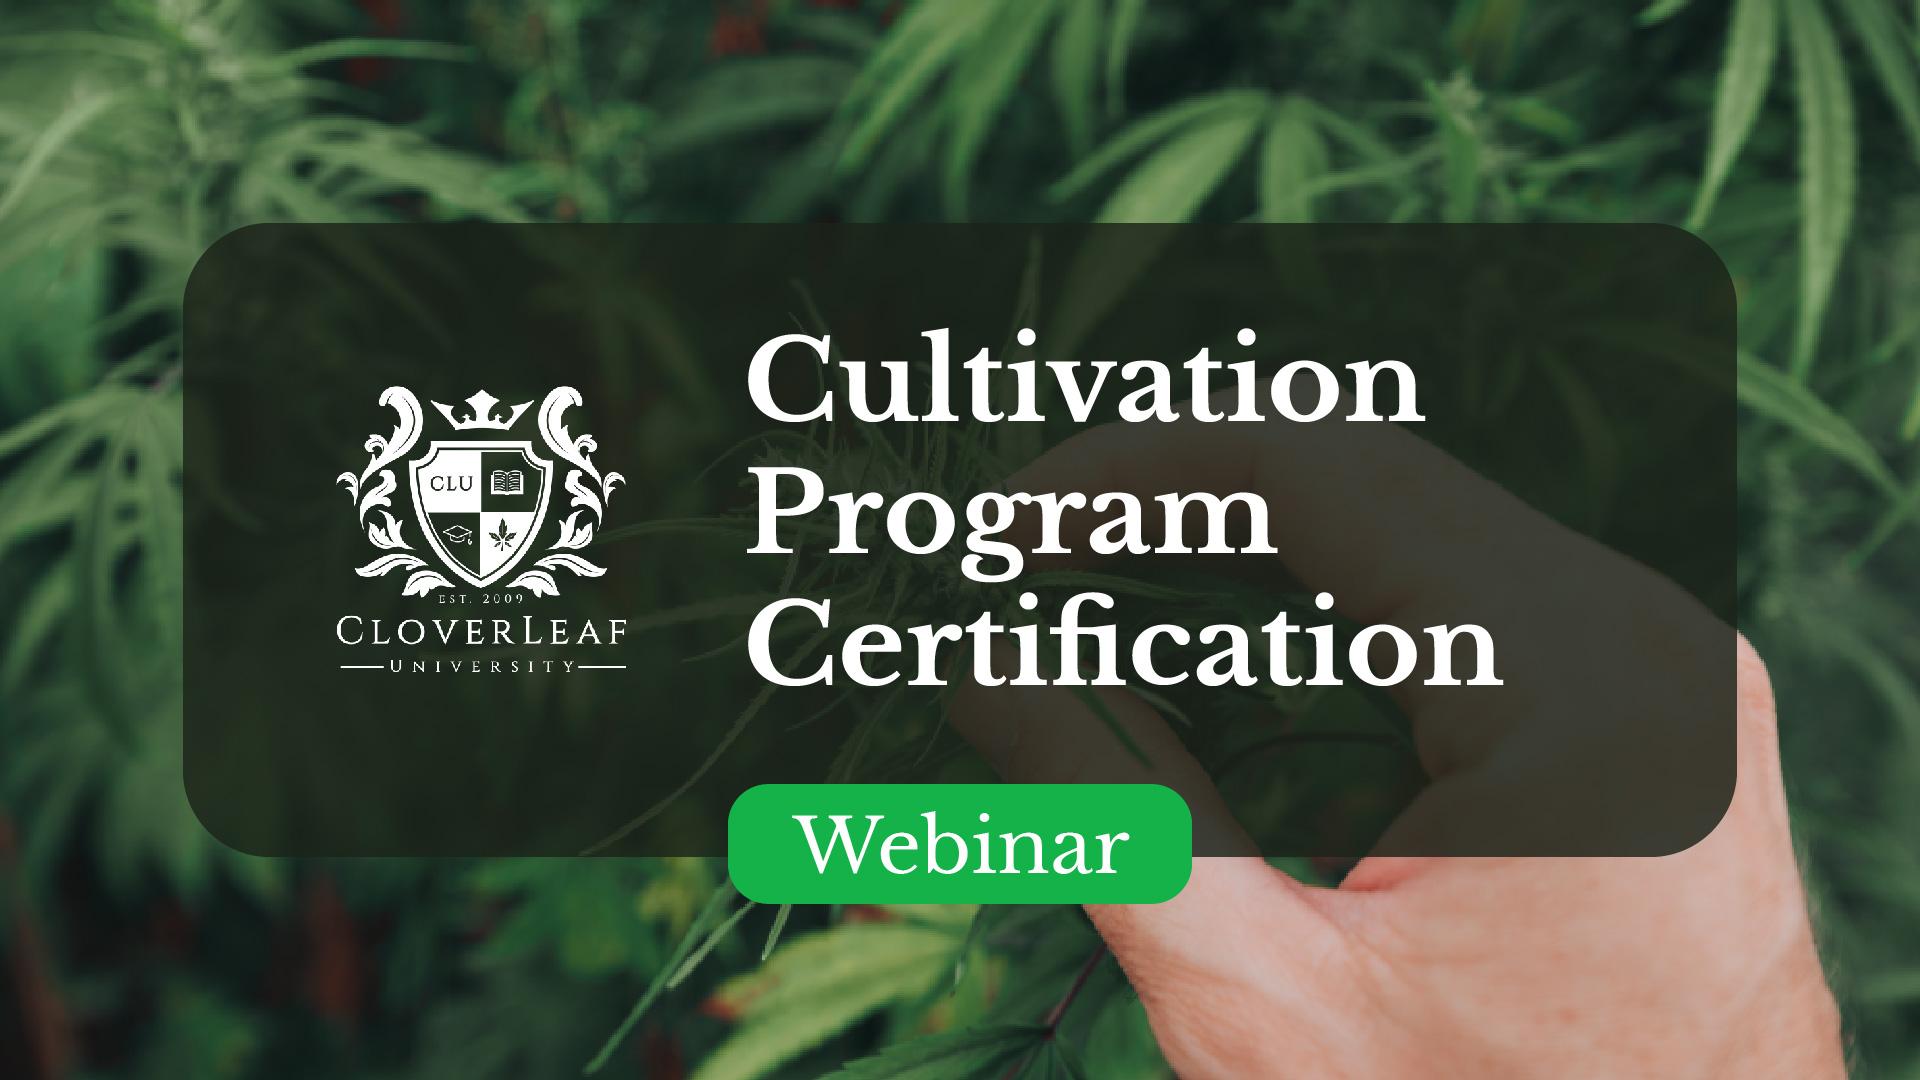 Cultivation Program Certification - Webinar